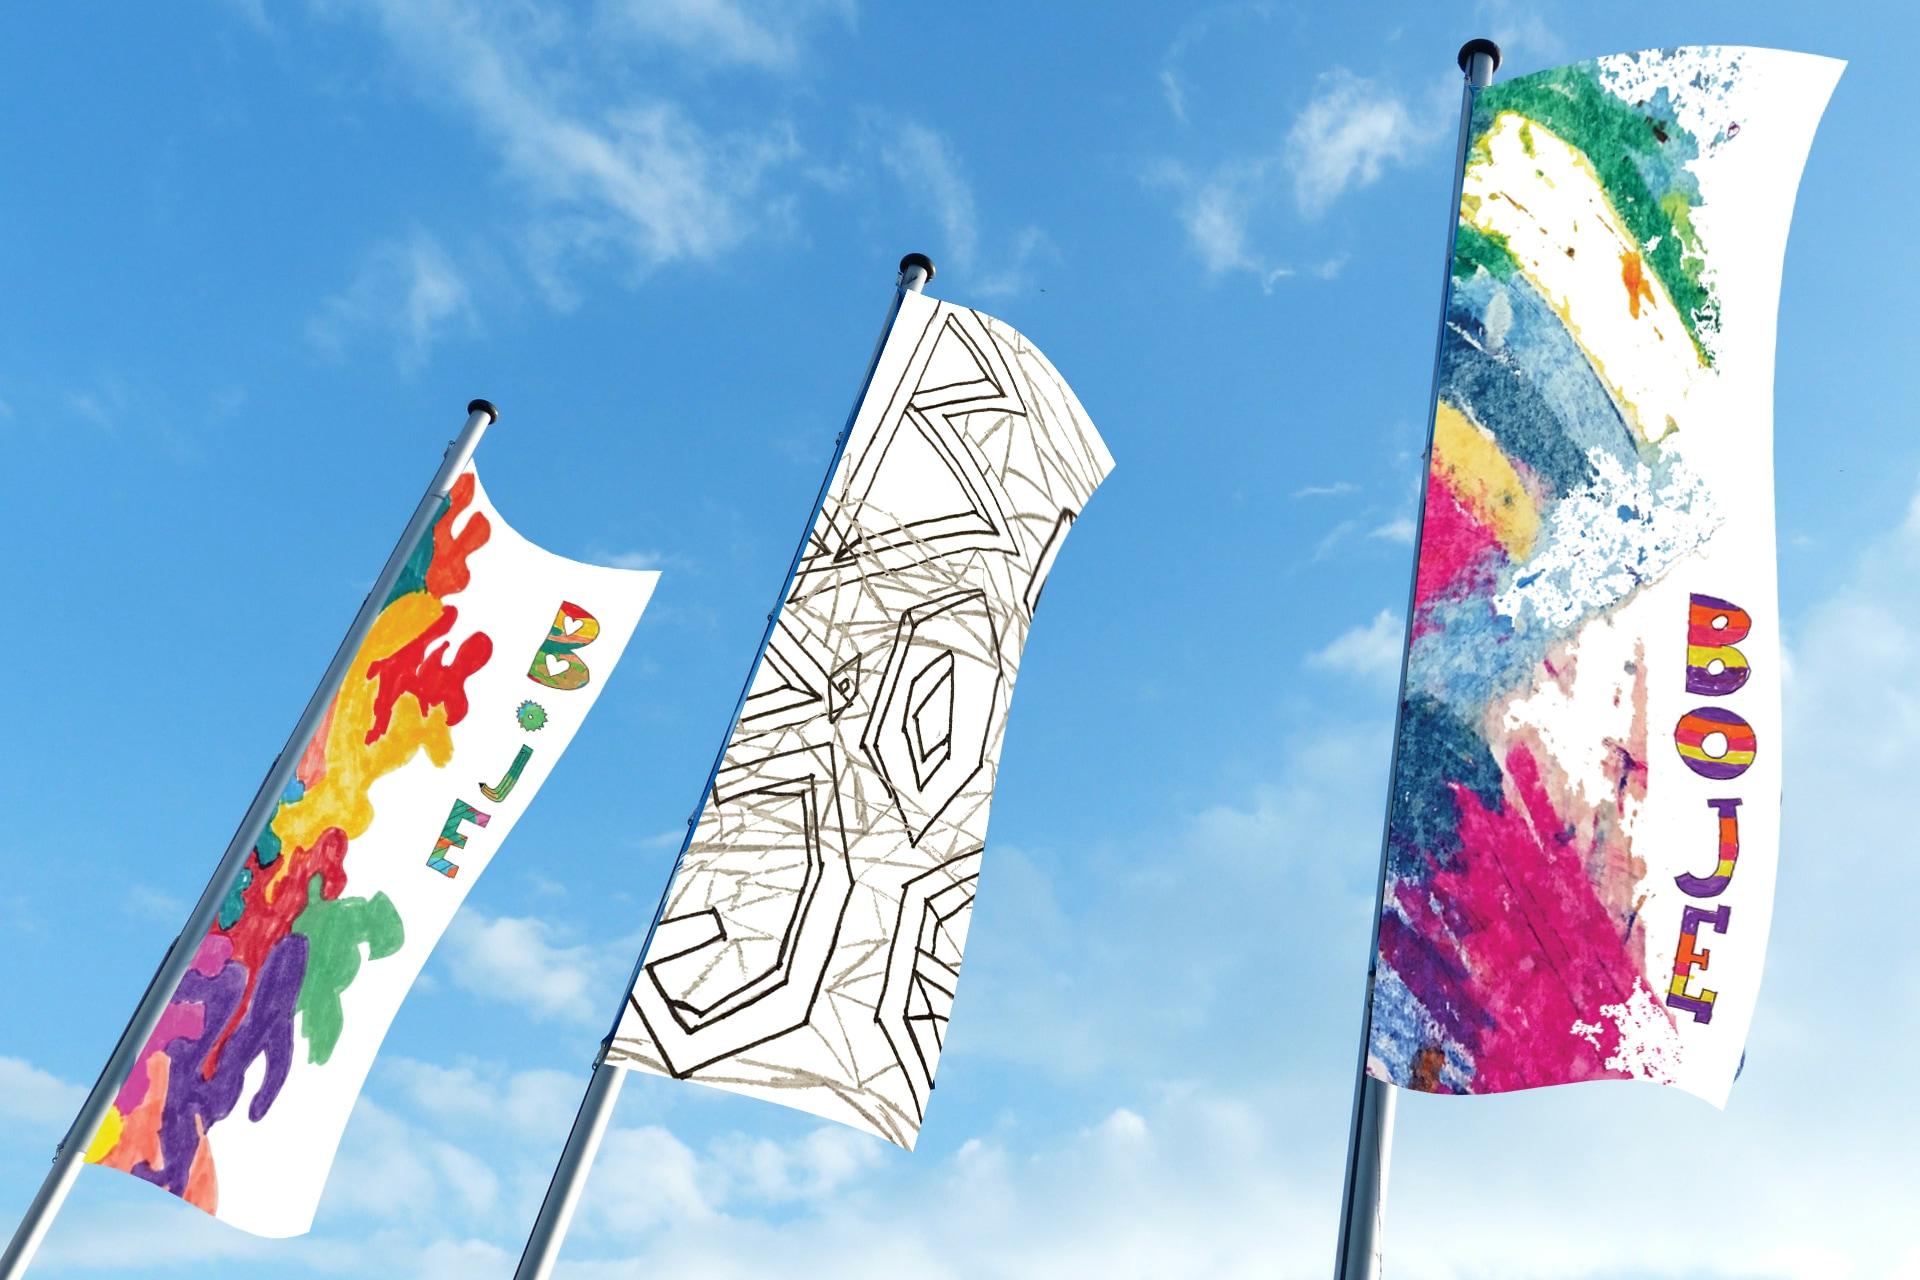 jugendkulturjahr-2020-ratingen-boje-flaggen